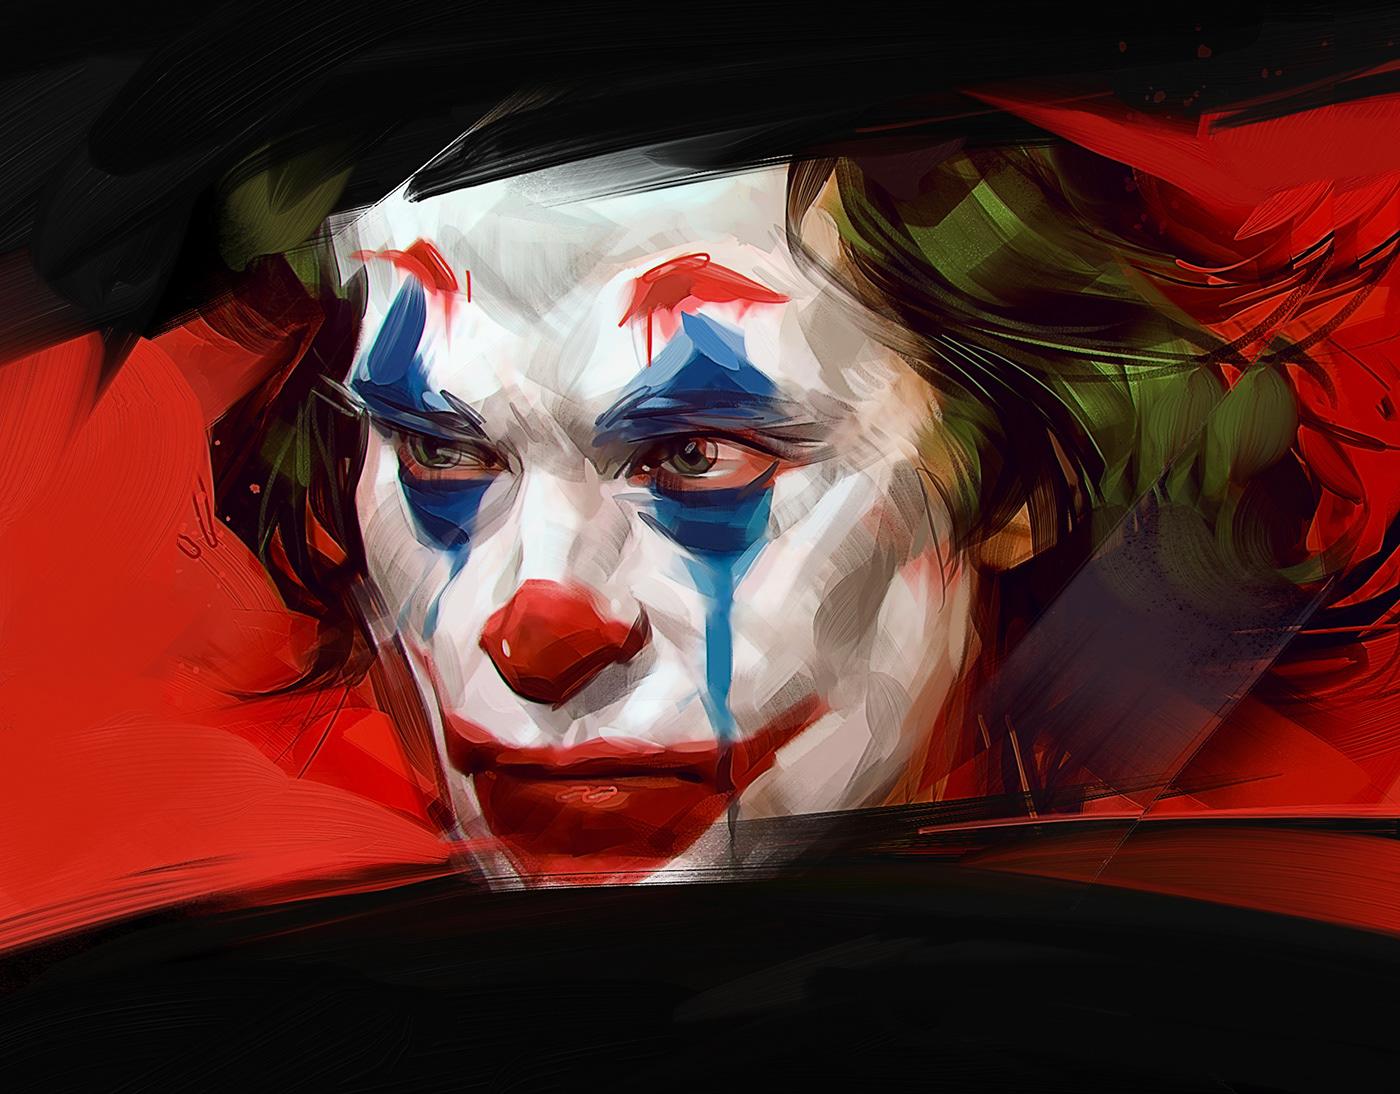 digital portrait paintings joker by viktor miller gausa by viktor miller gausa